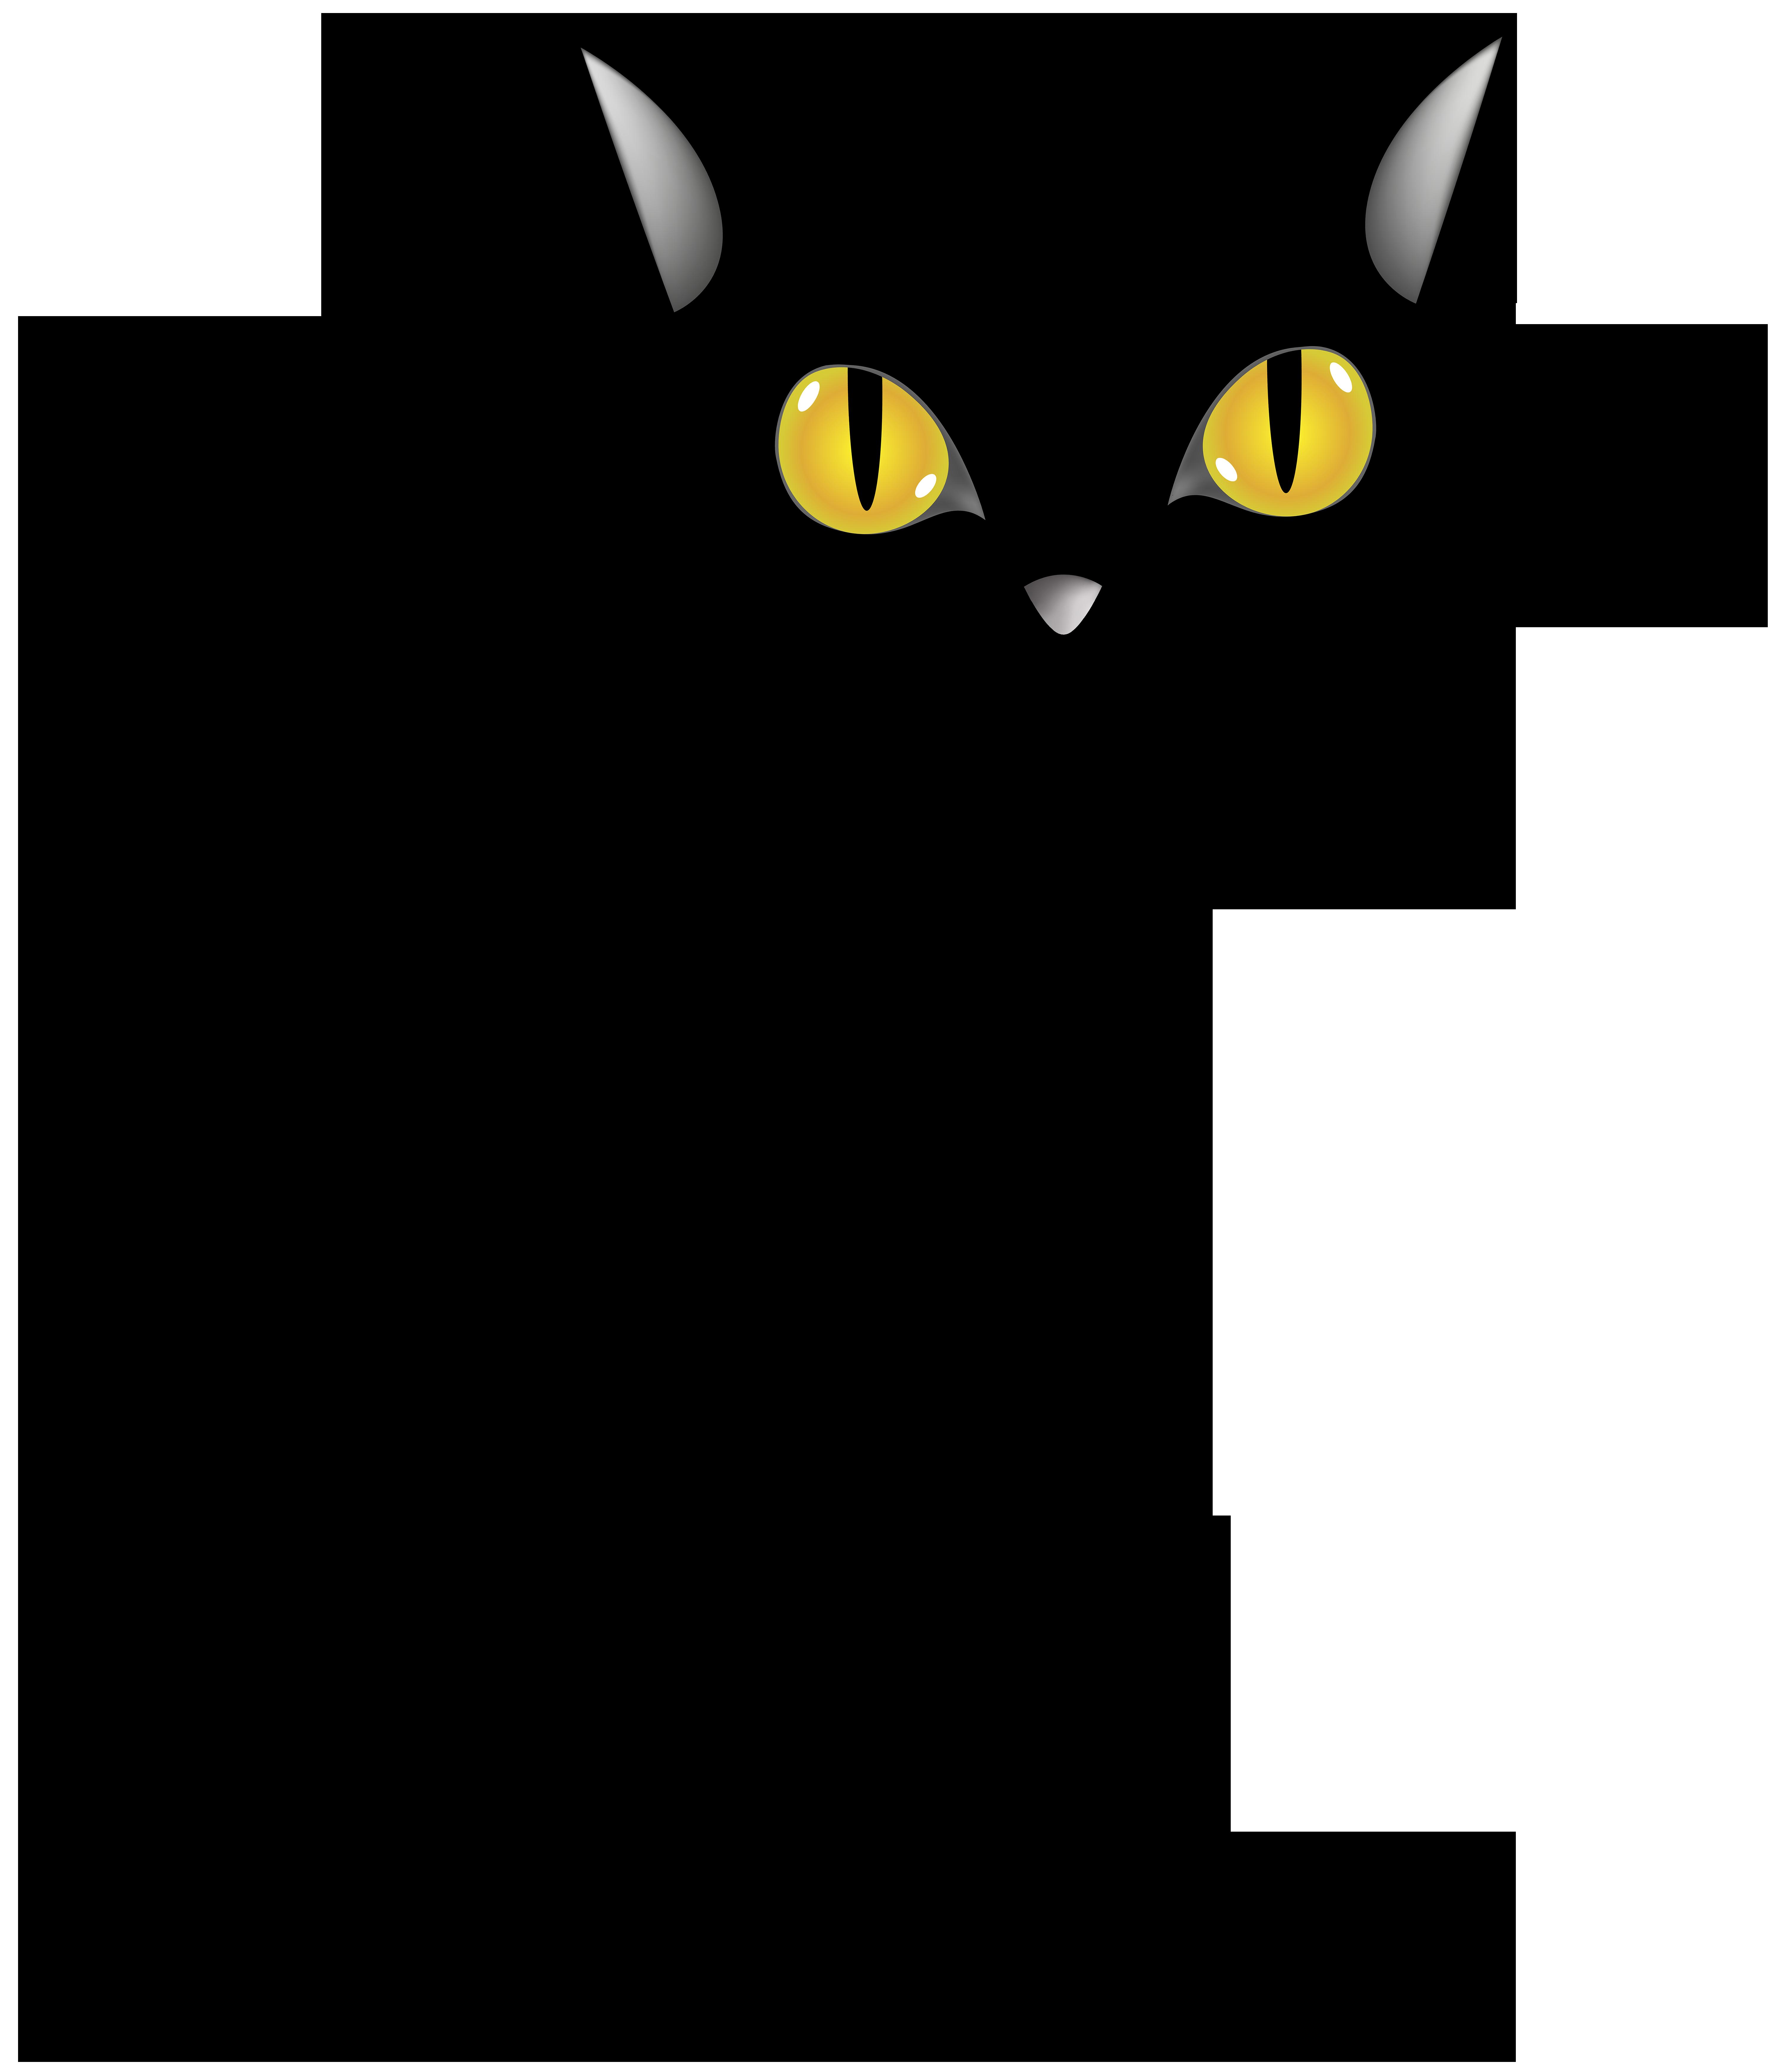 Halloween Black Cat PNG Clip Art Image | Gallery ...